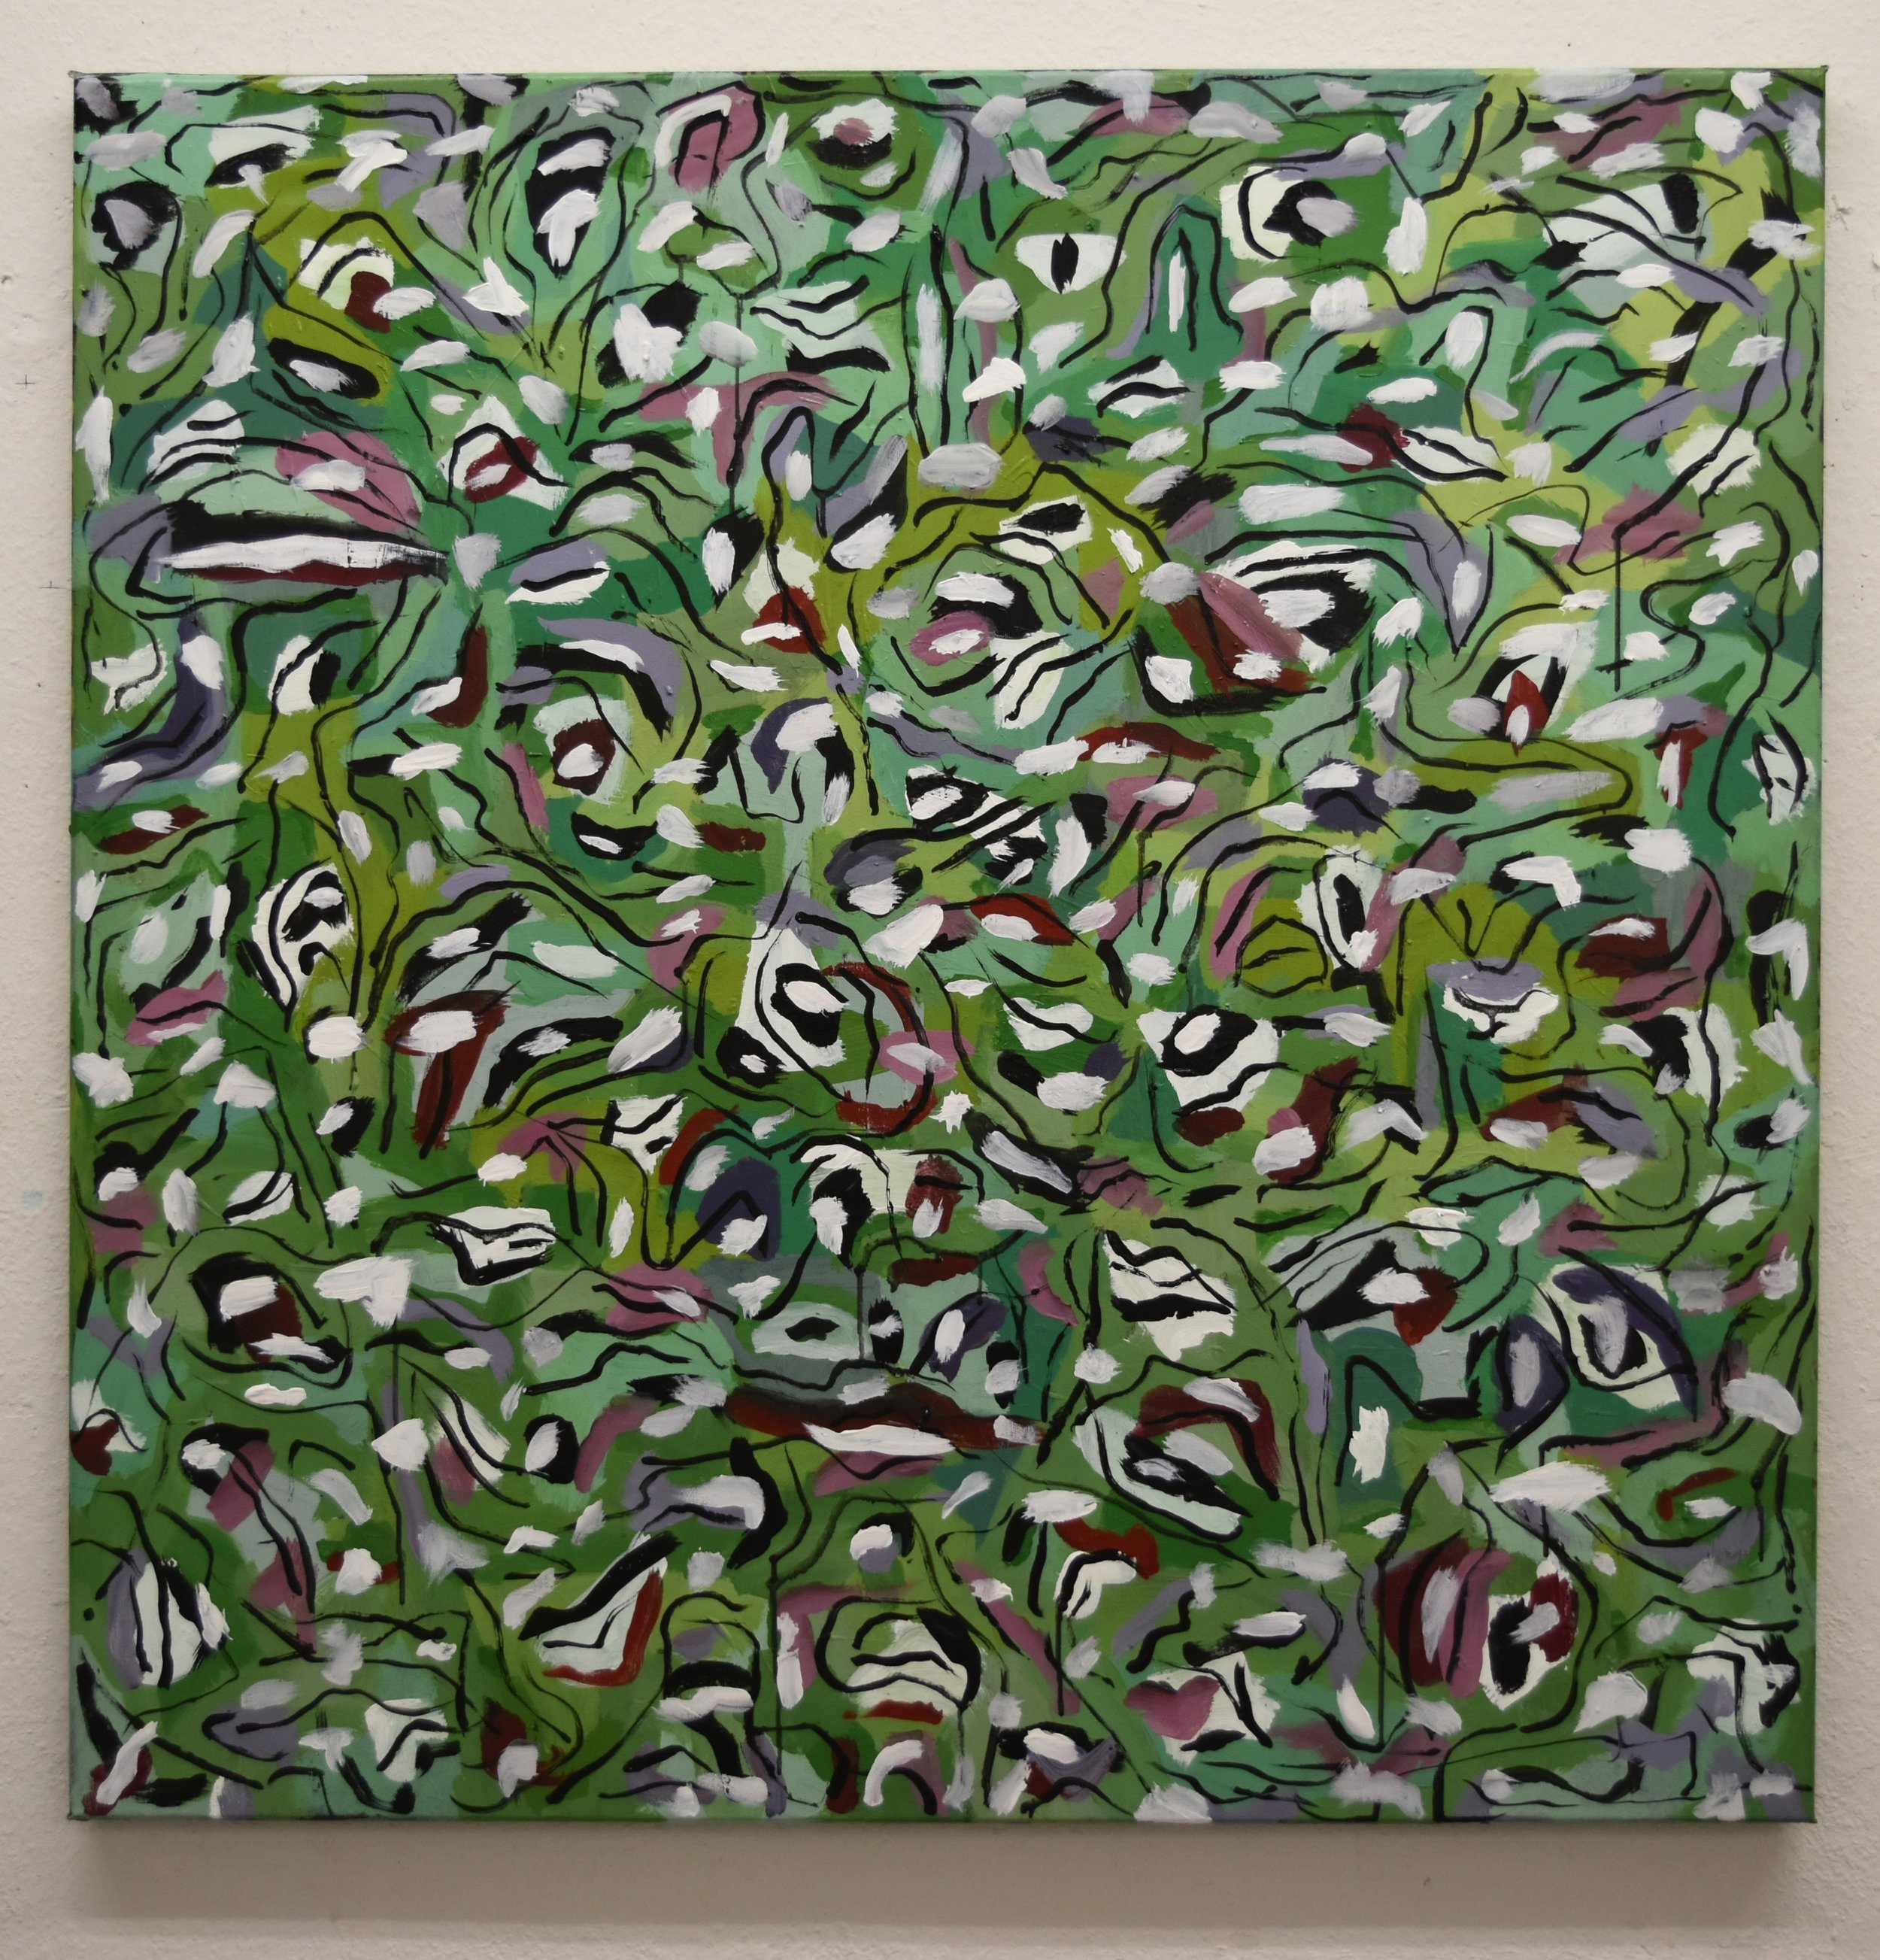 Acrylic on canvas  100x100cm 39.3x39.3in